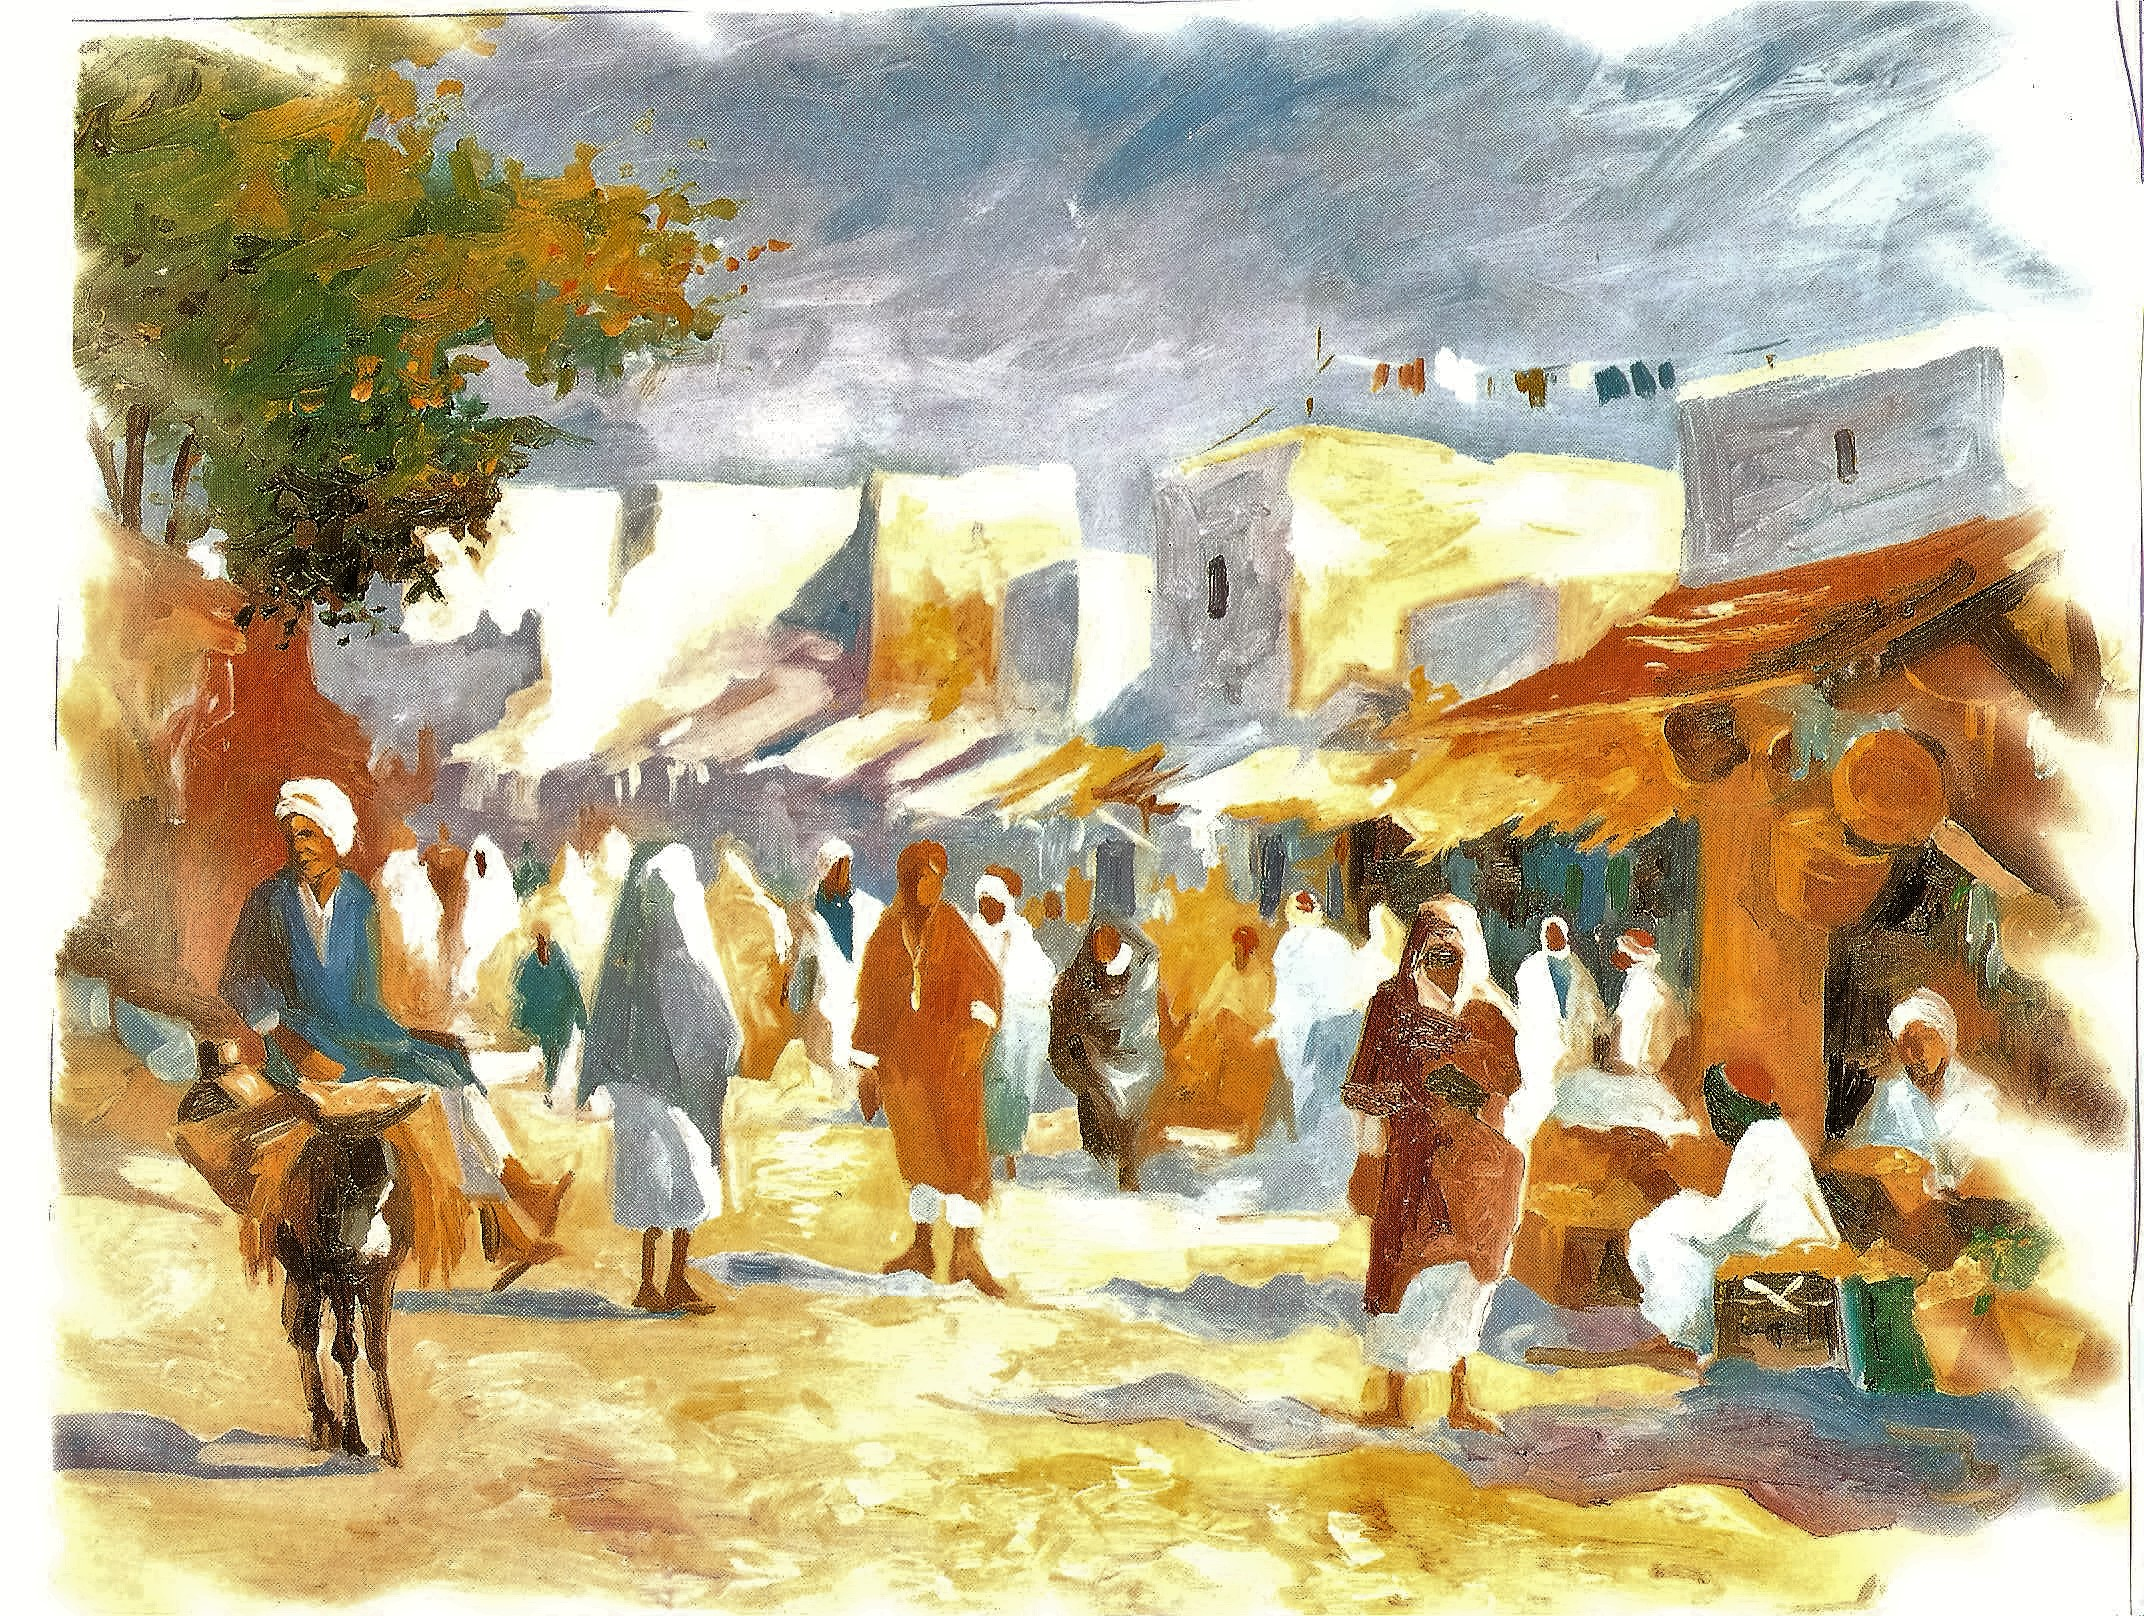 femme الحي العتيق المرأة